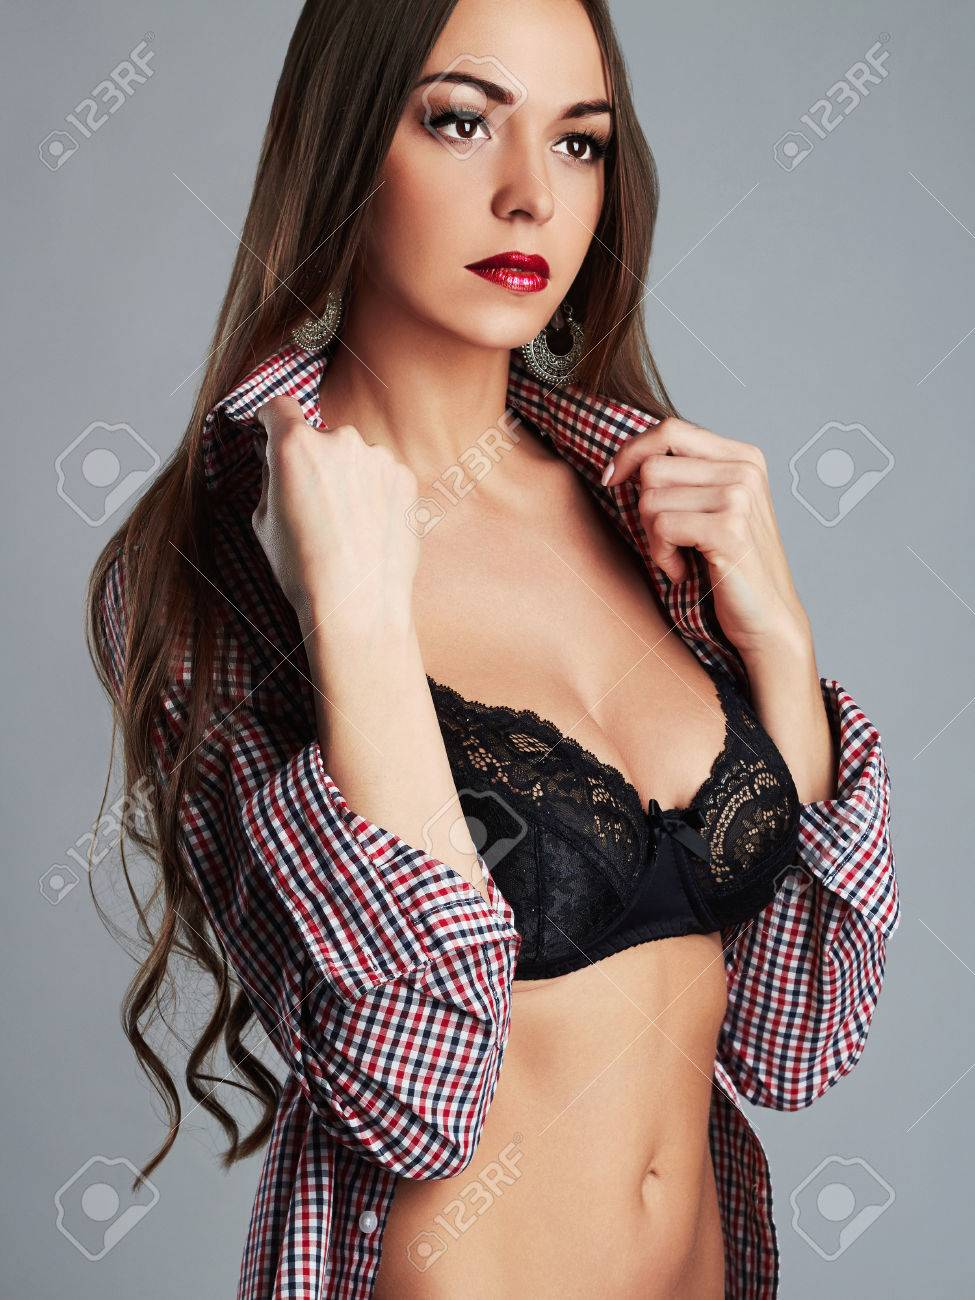 Pic woman beauty tits